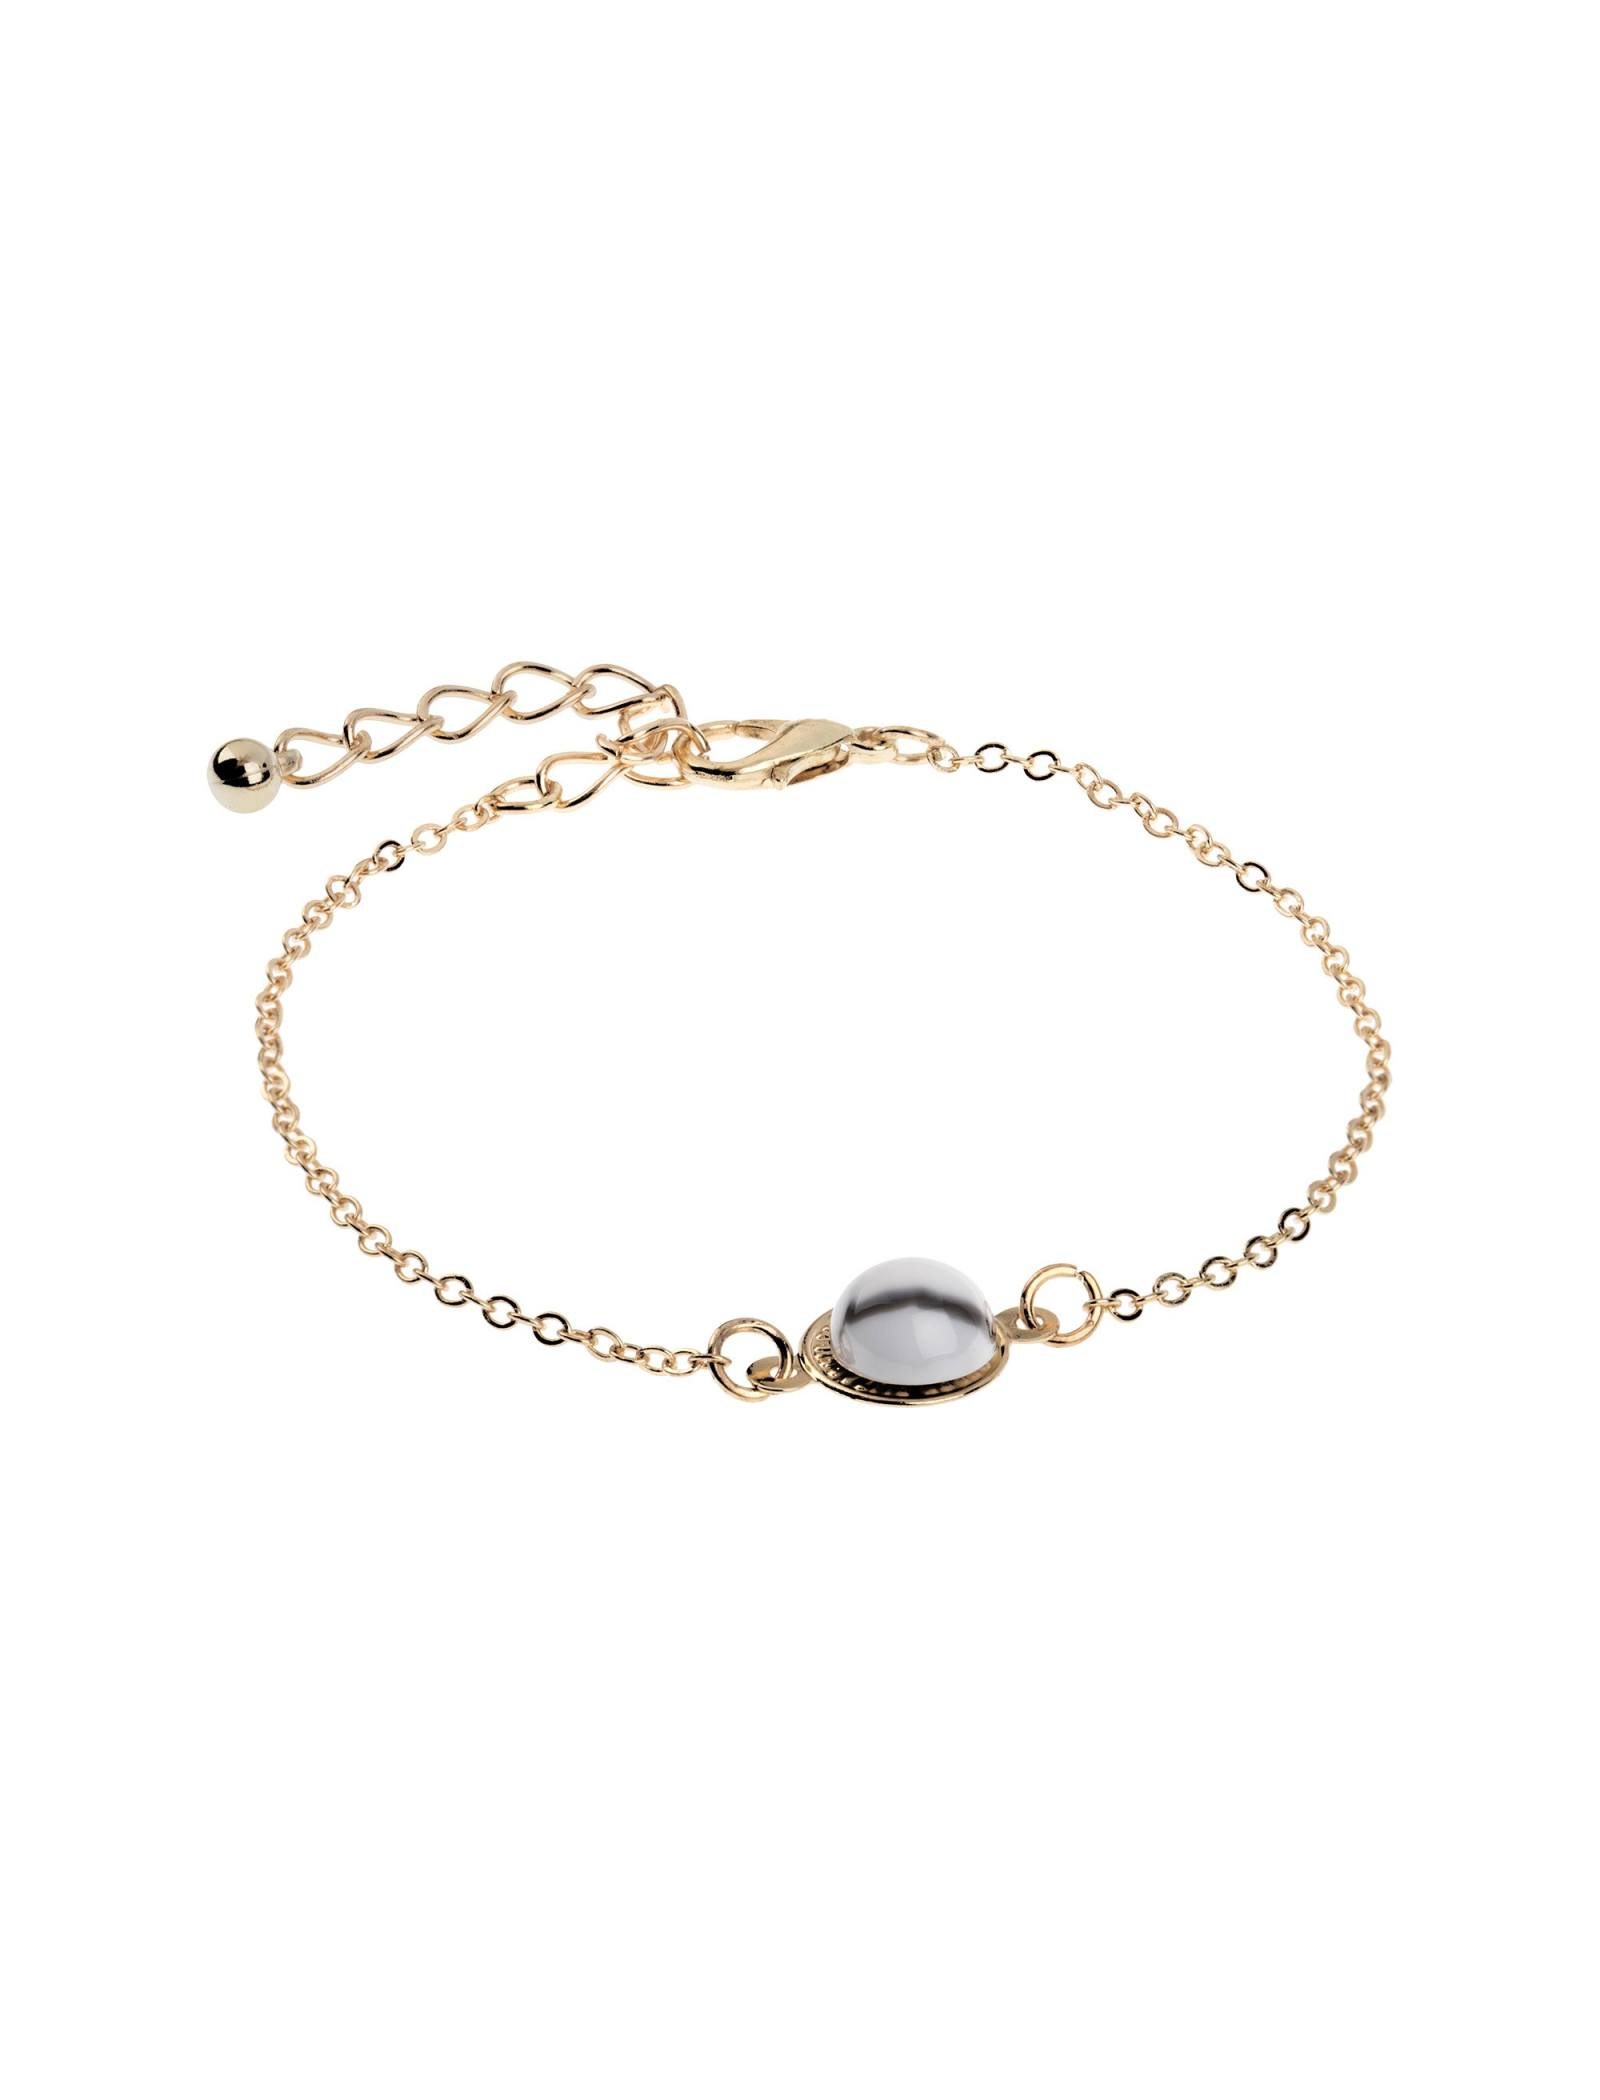 دستبند زنانه بسته 3 عددی - کوتون - طلايي/ طوسي - 2